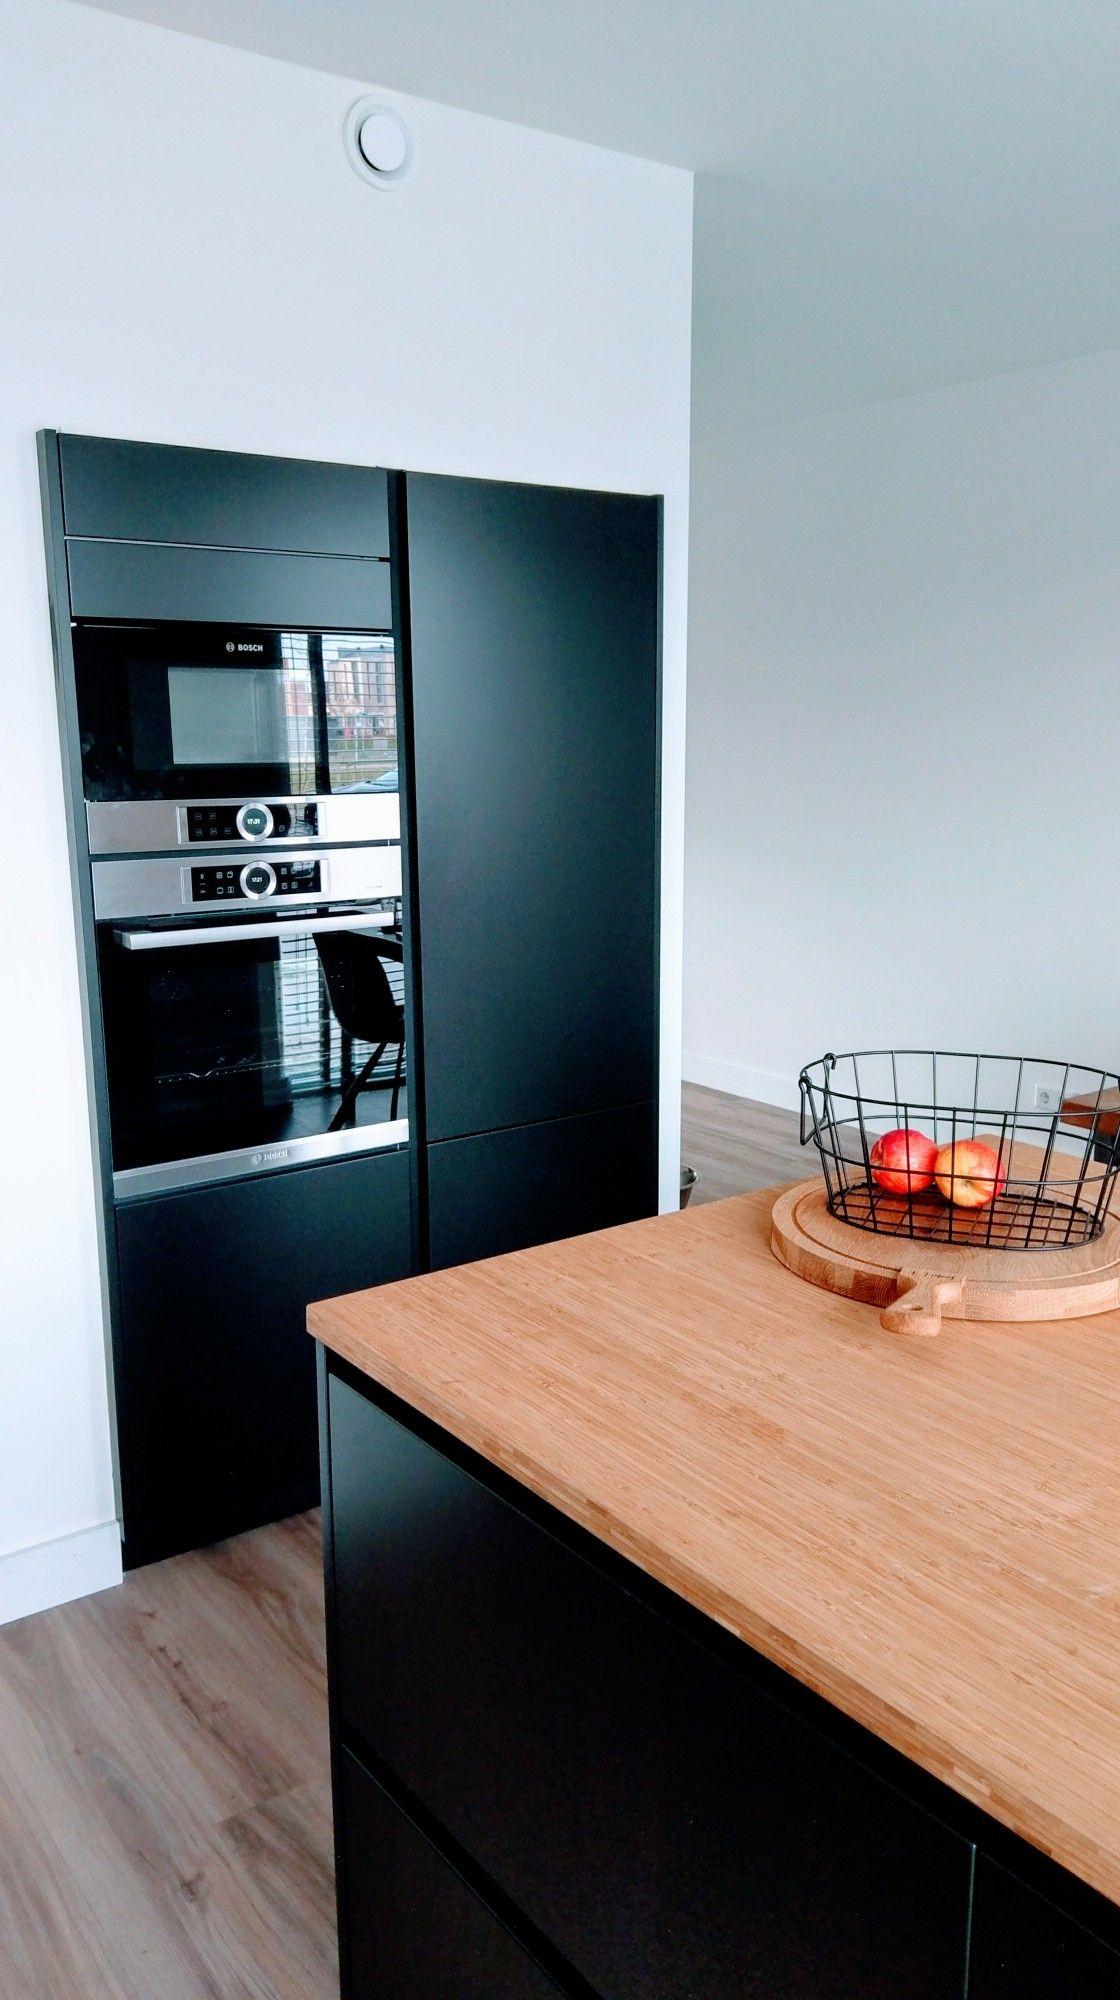 my kvik tinta black kitchen with bamboo countertop black kitchens bamboo countertop kitchen on kitchen decor black countertop id=82109